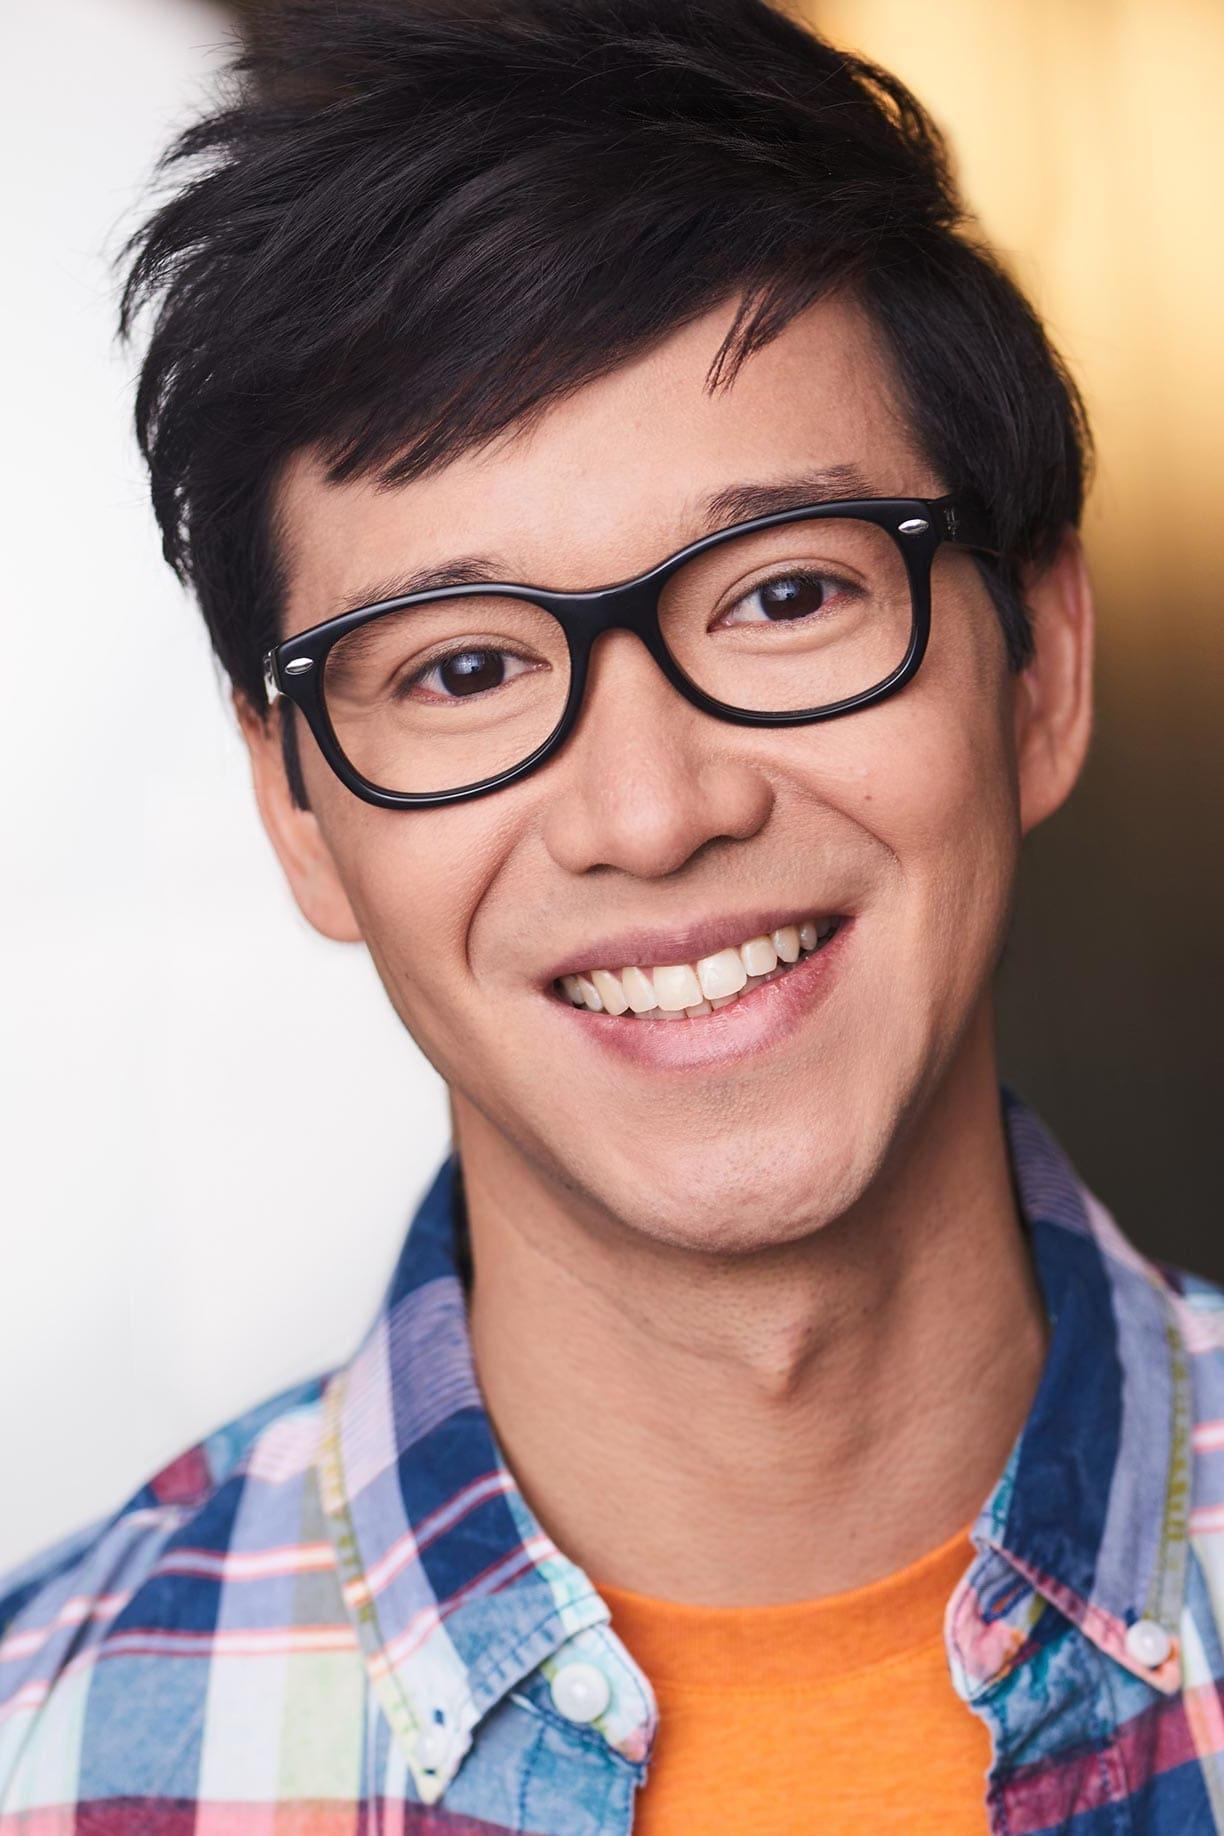 Ricky Titus-Lam